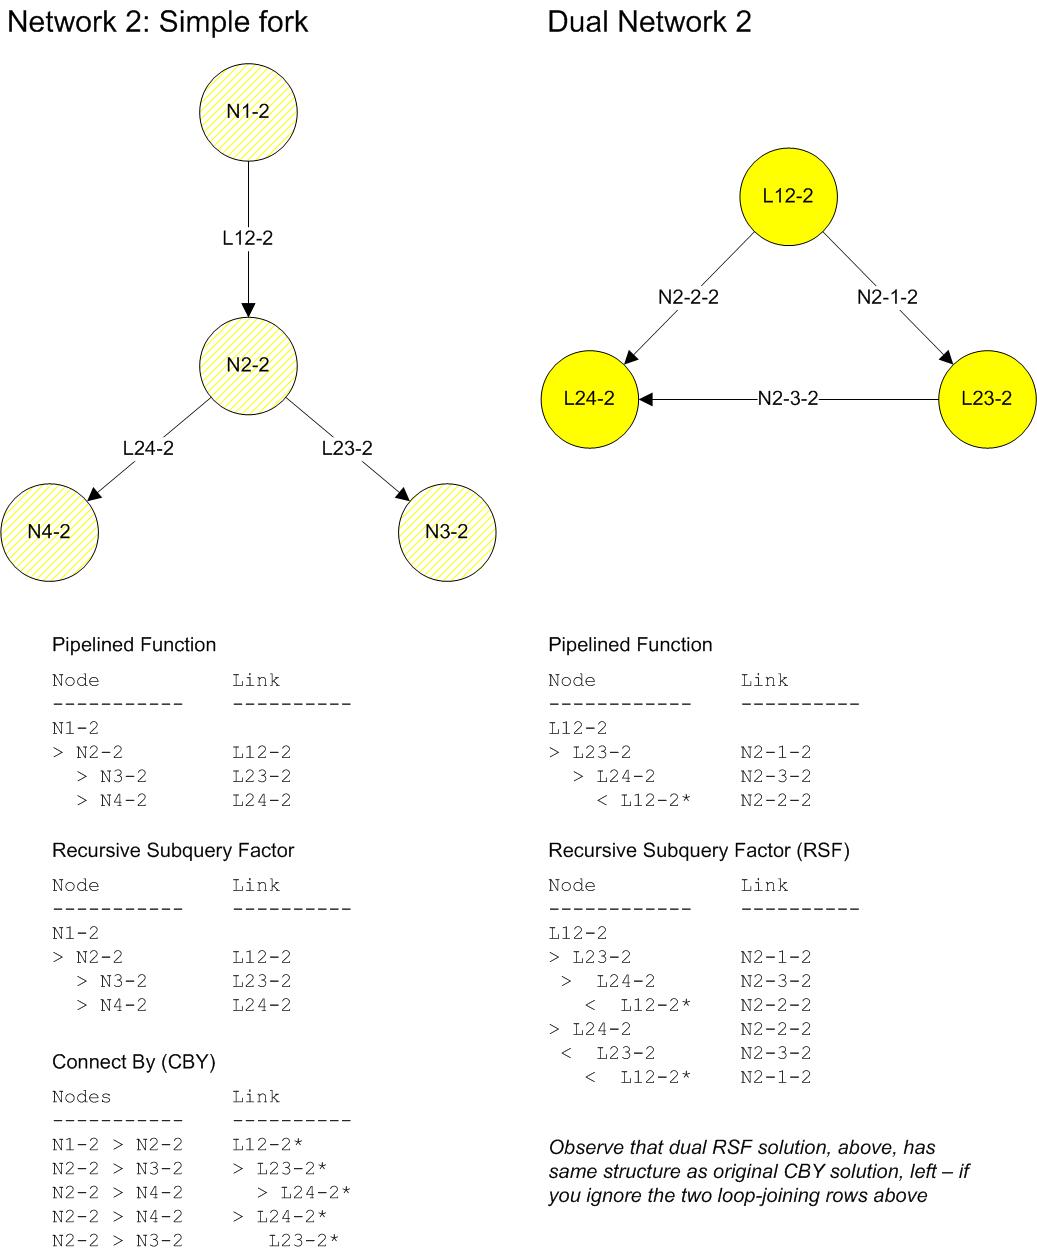 Dual Network, 1.3 - net-2